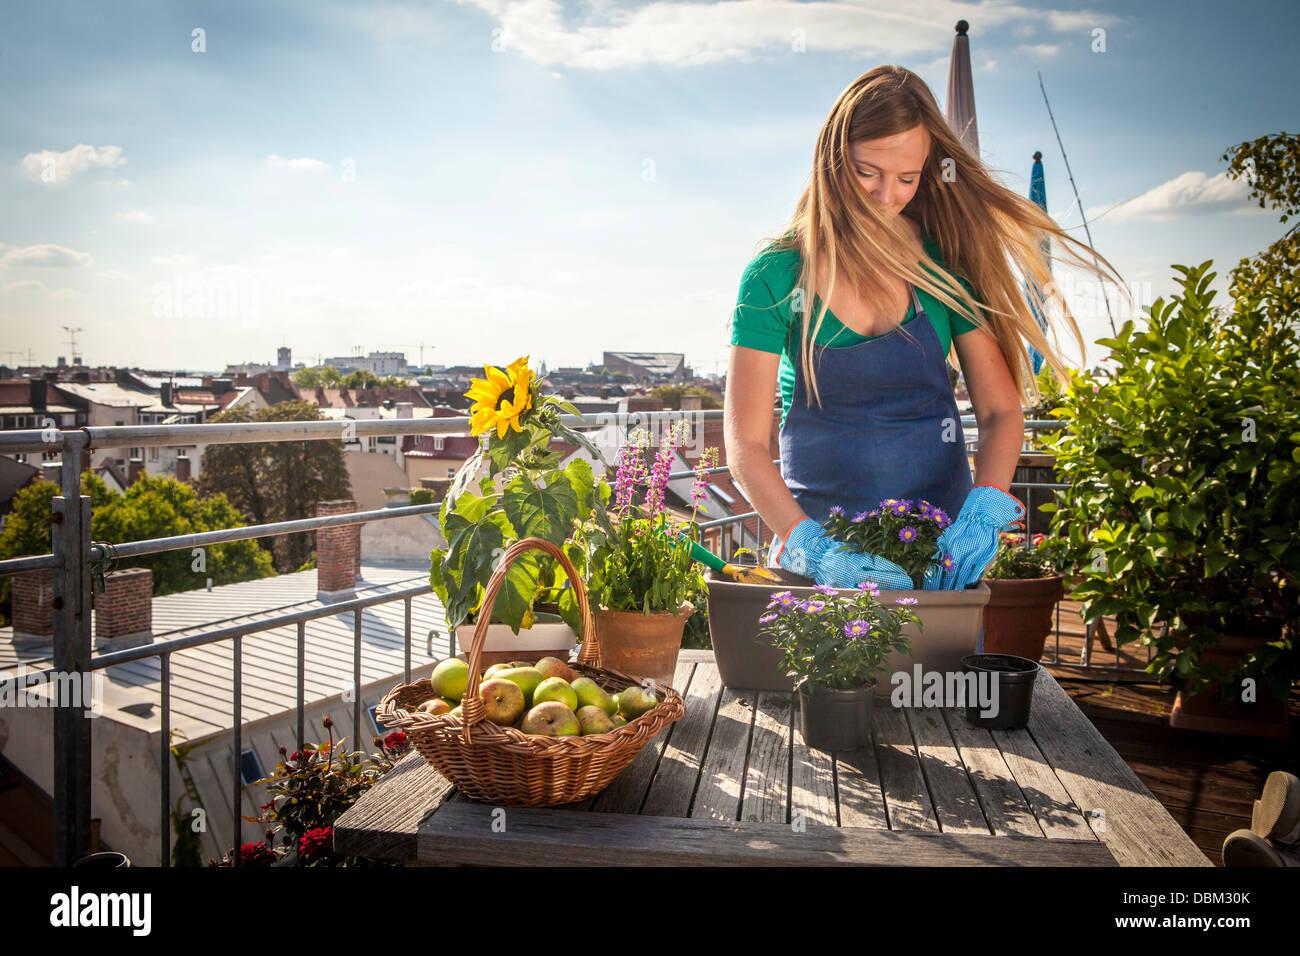 Woman On Balcony Planting Up Flower Box, Munich, Bavaria, Germany, Europe - Stock Image